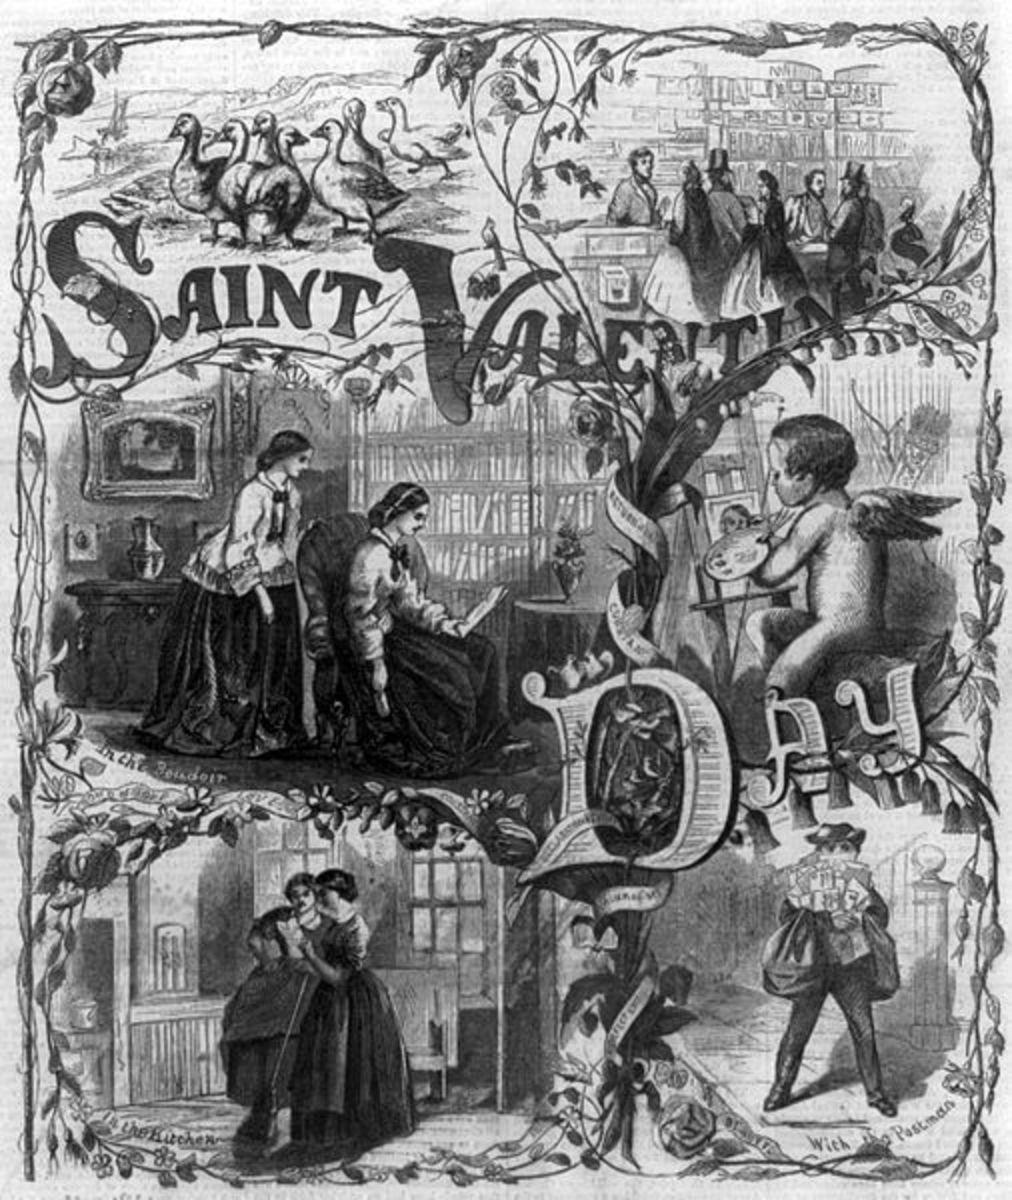 Vintage Valentine's Day Image: Vintage Saint Valentine's Day 1861